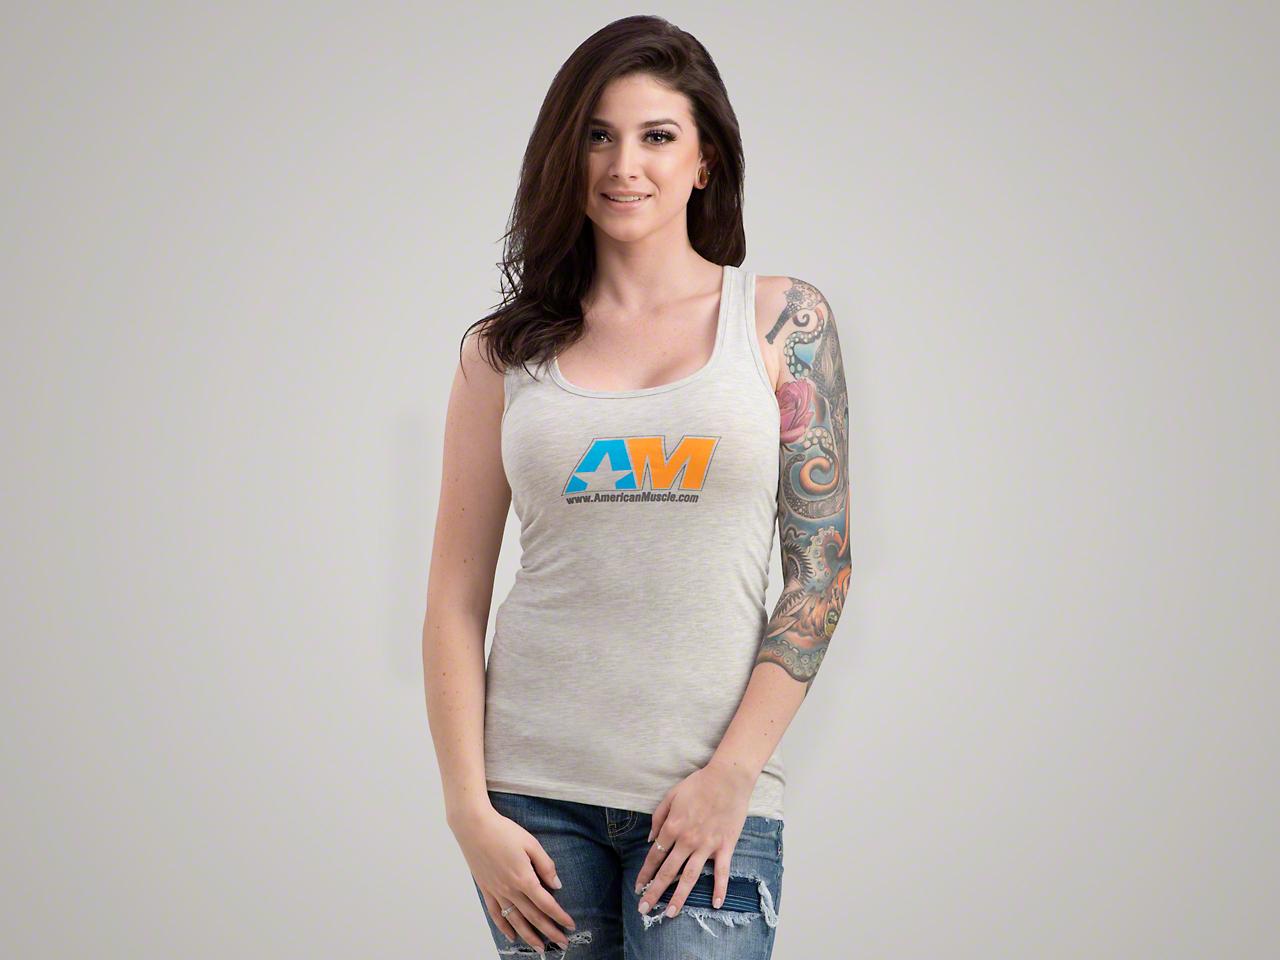 AM Legacy Tank Top - Womens